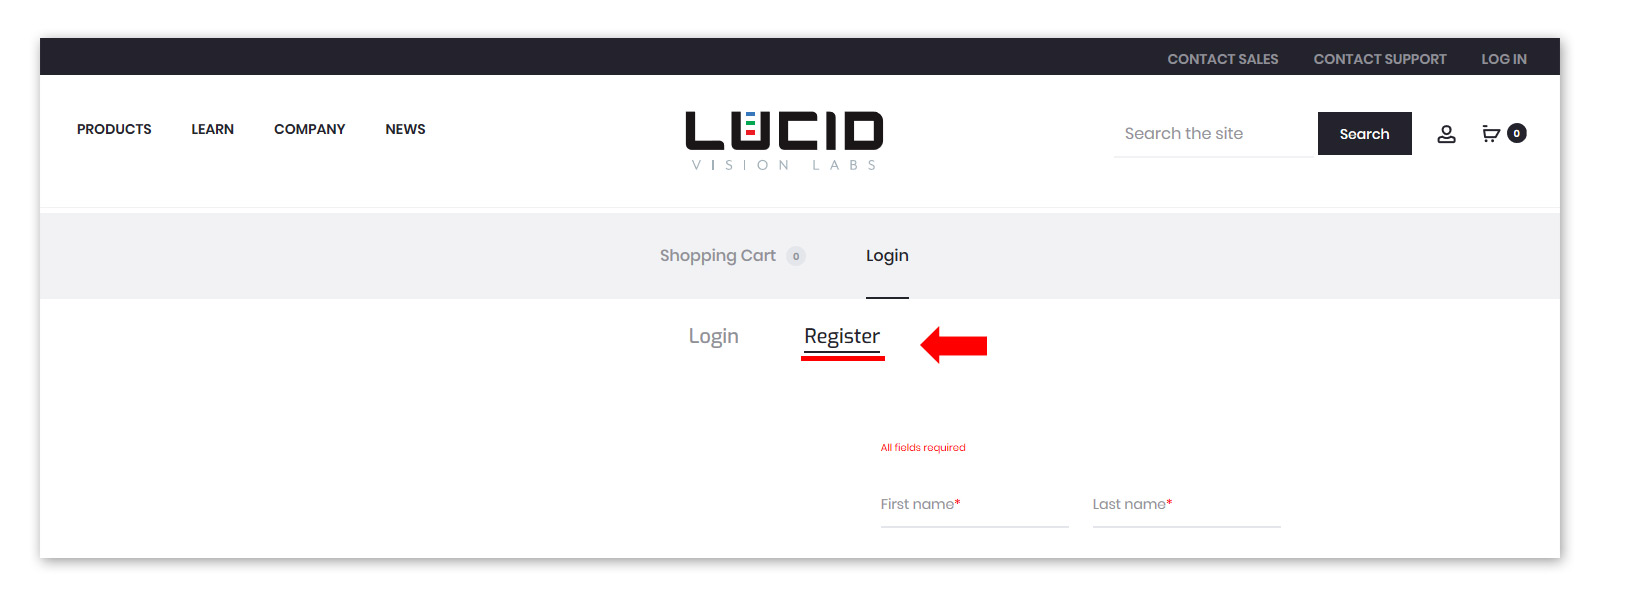 Lucid webstore instructions step 2